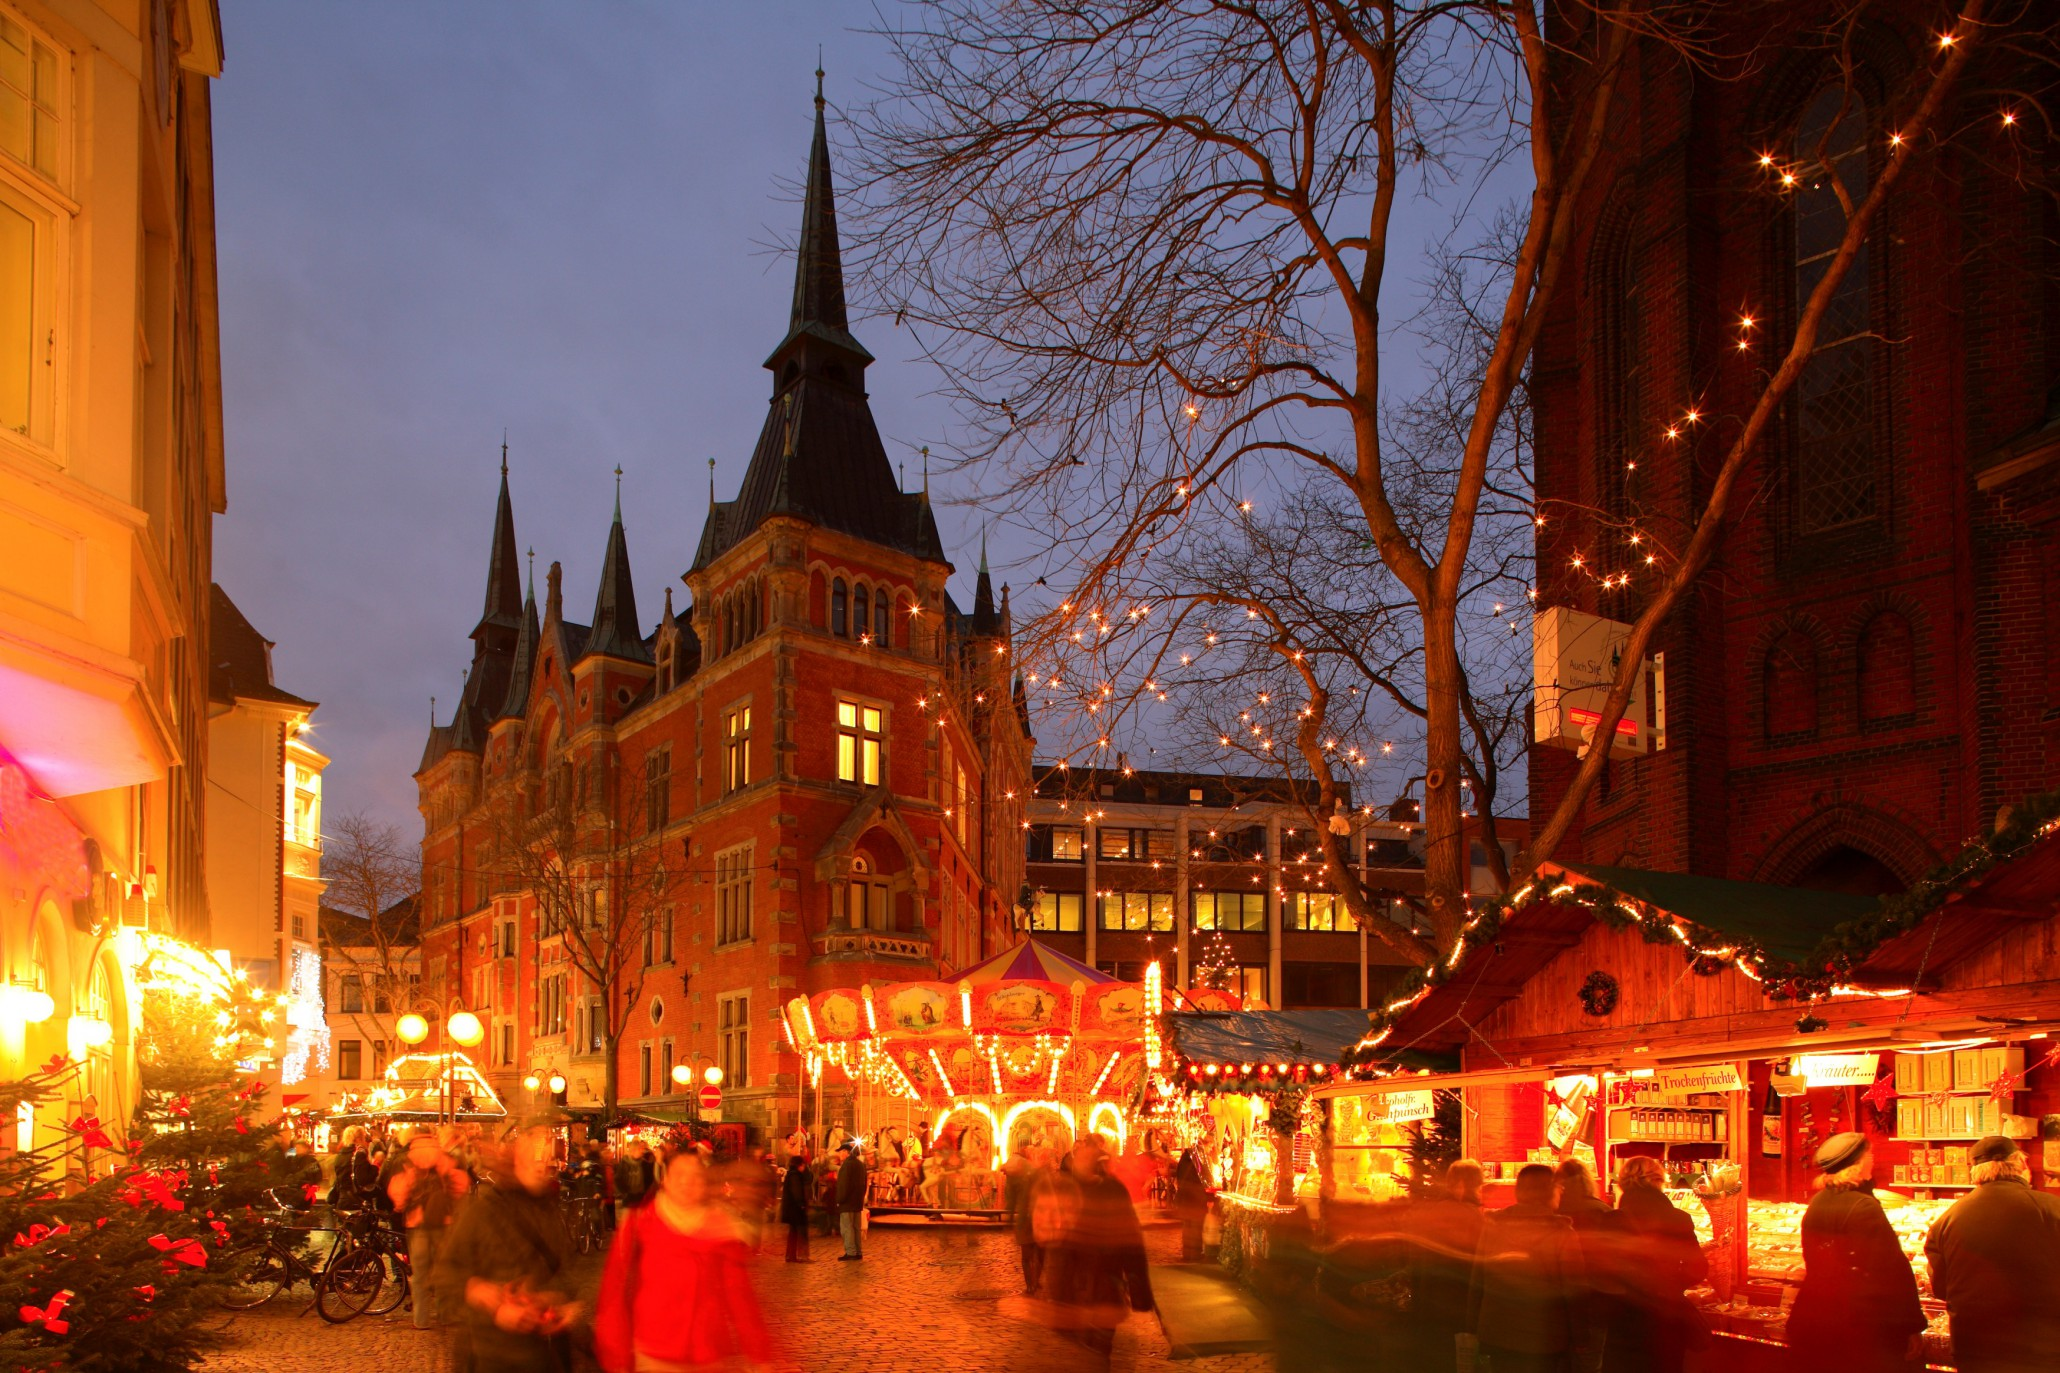 Markt De Oldenburg